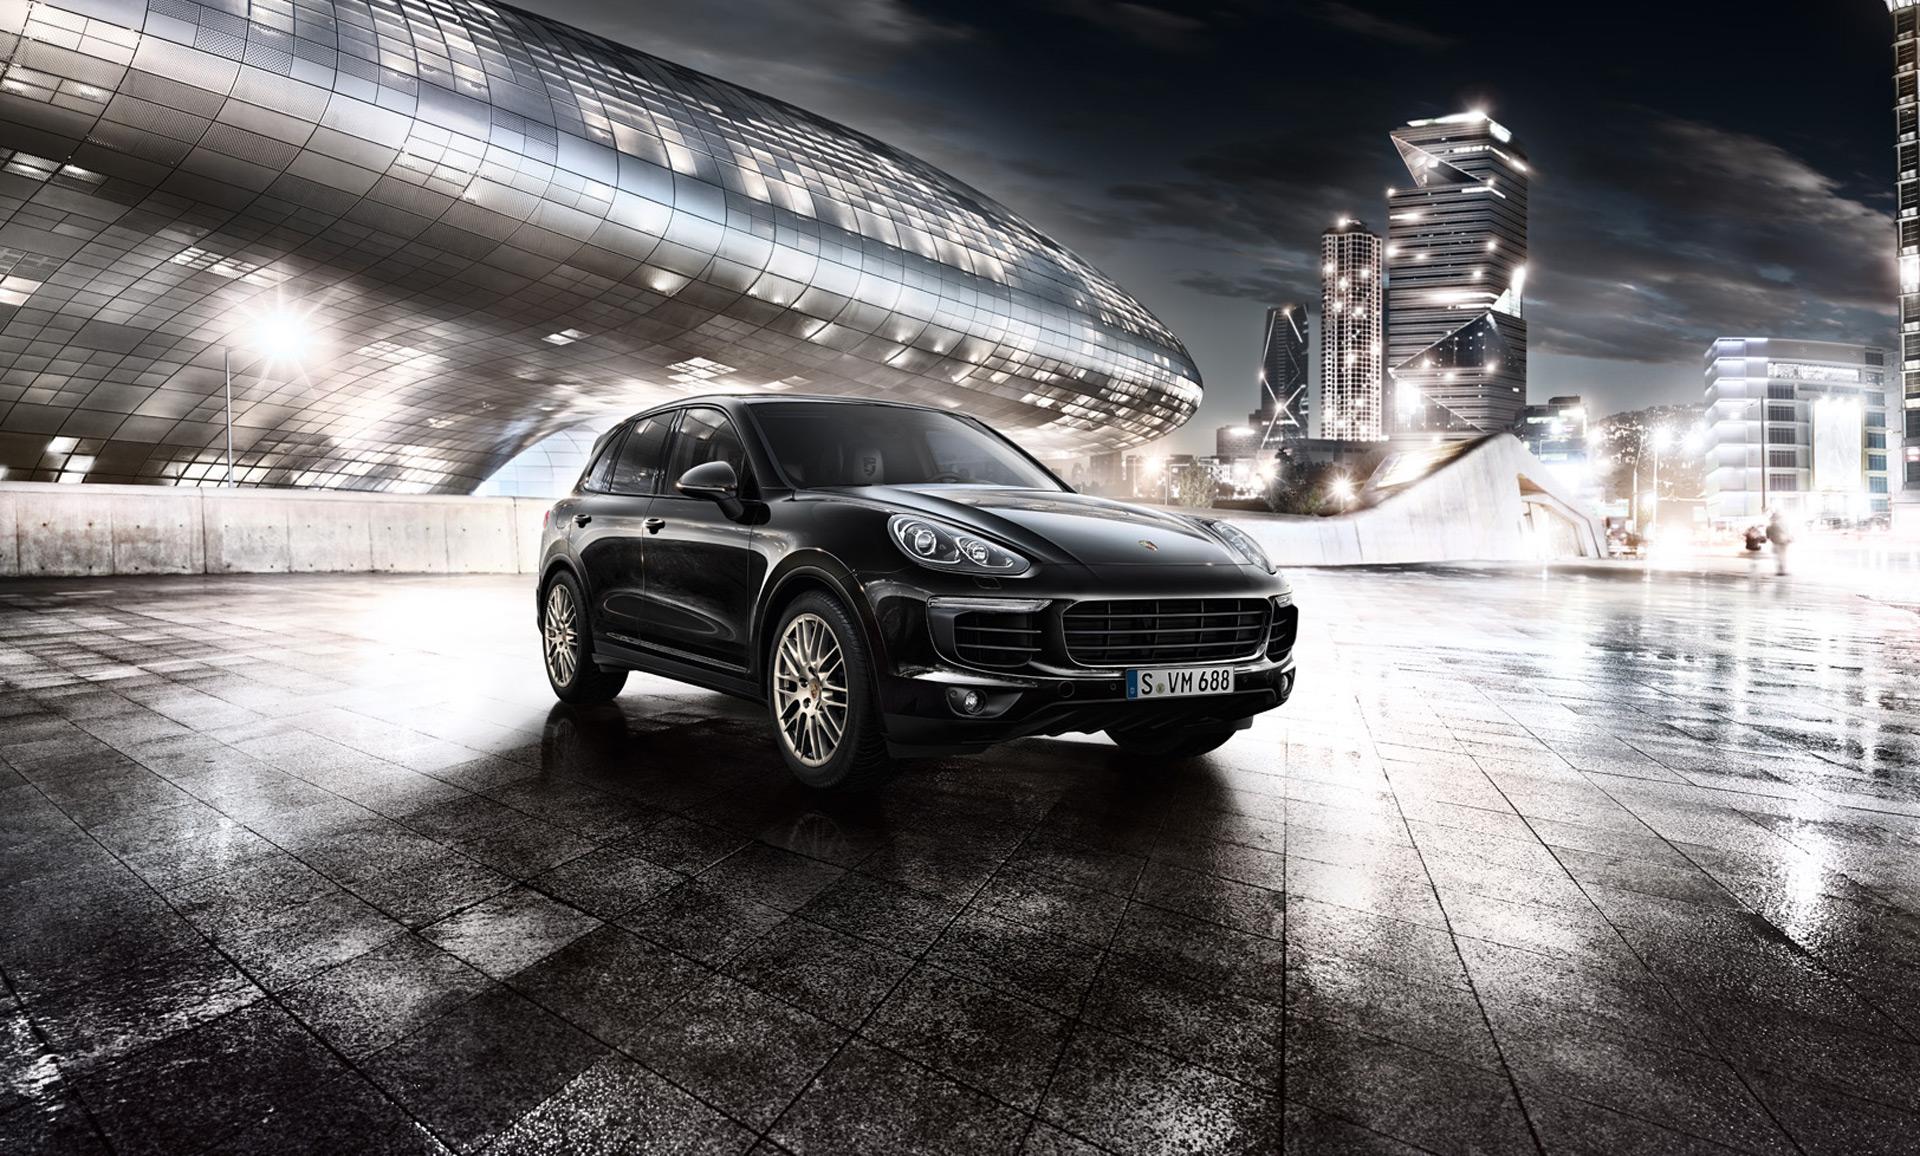 Porsche Los Angeles >> 2017 Porsche Cayenne preview